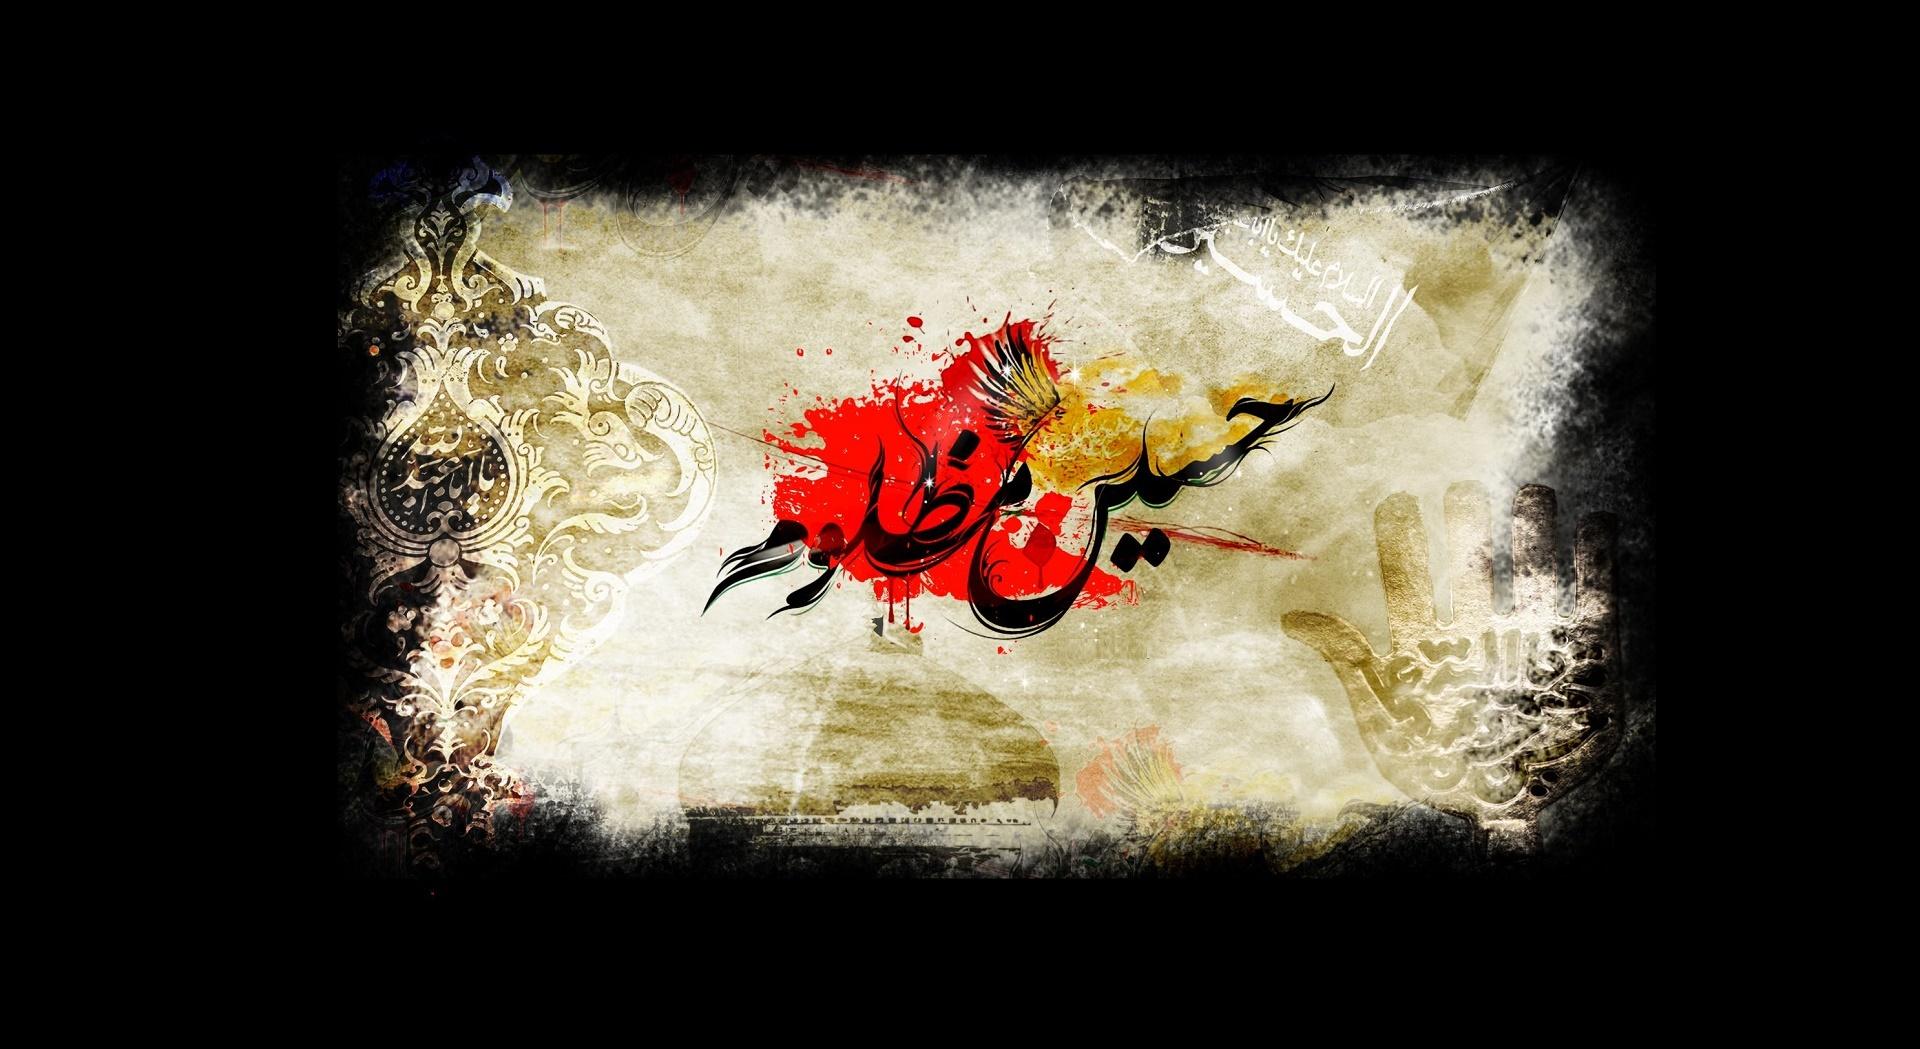 ITRESAN_Muharram_Wallpaper-3